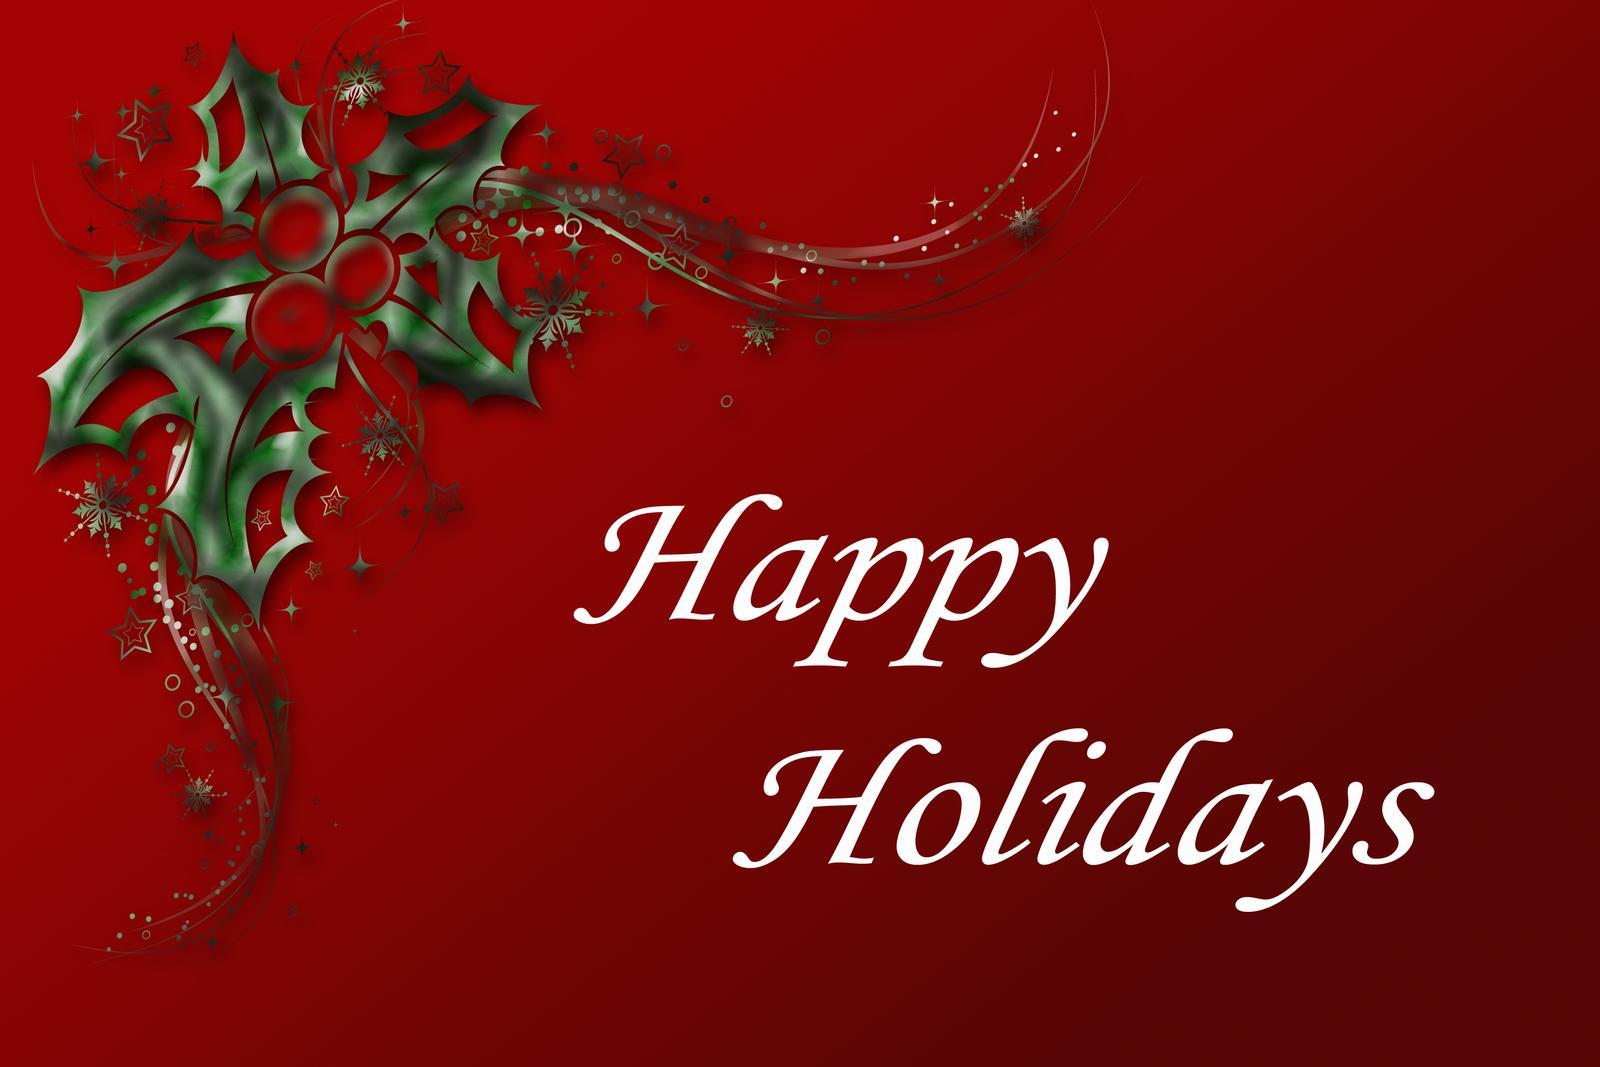 Happy Holidays Wallpaper Sf Wallpaper